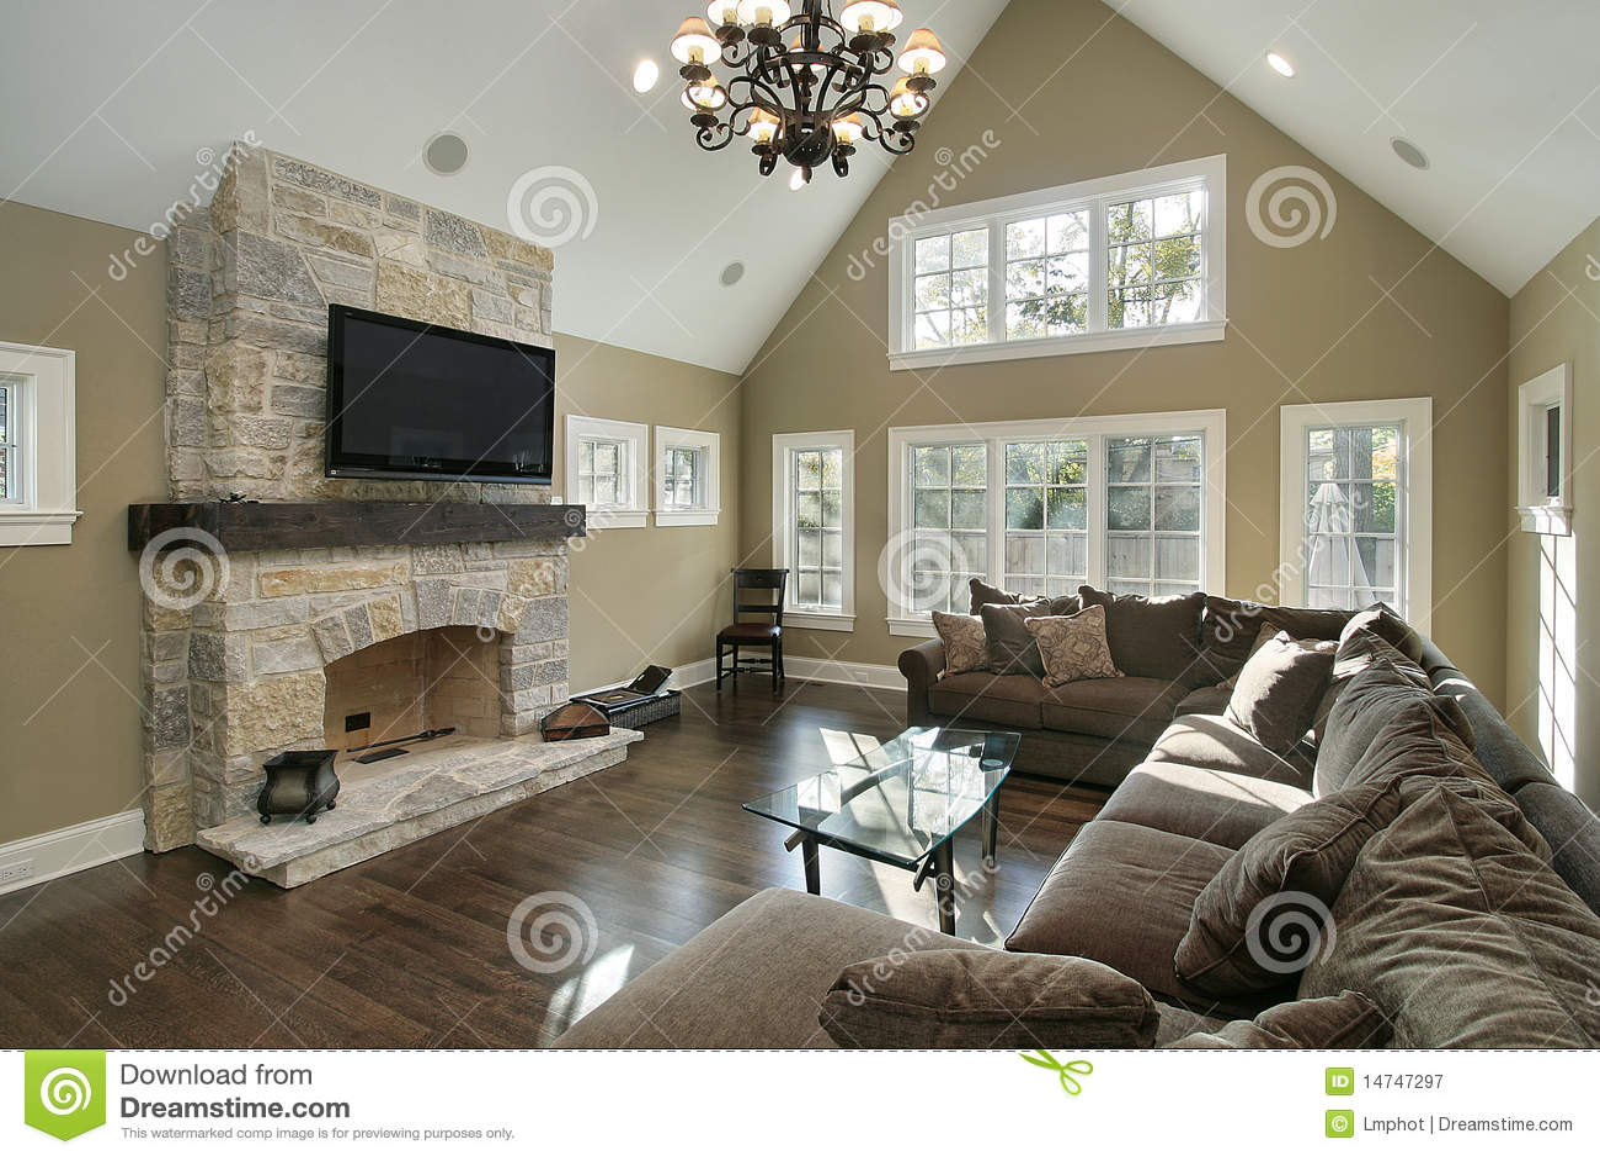 sofa table design plans tienda de sofas zona norte madrid family room with stone fireplace royalty free stock ...